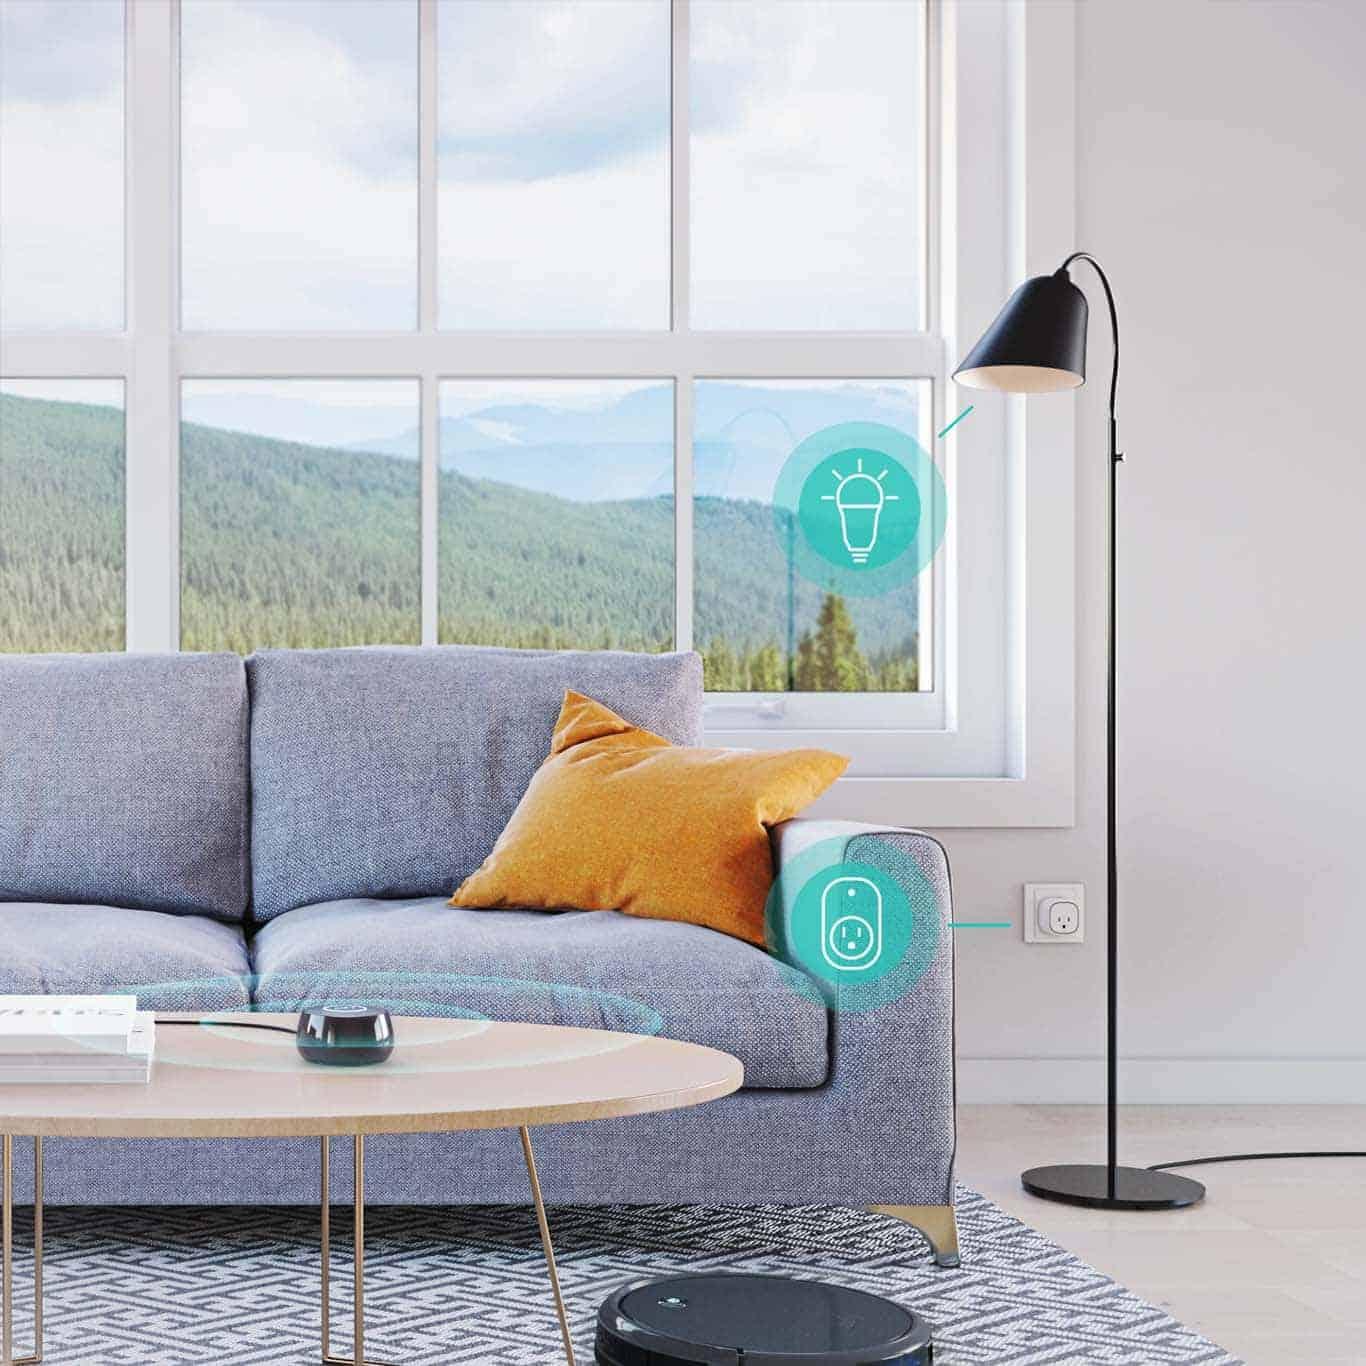 Anker Eufy Genie Smart Speaker 10